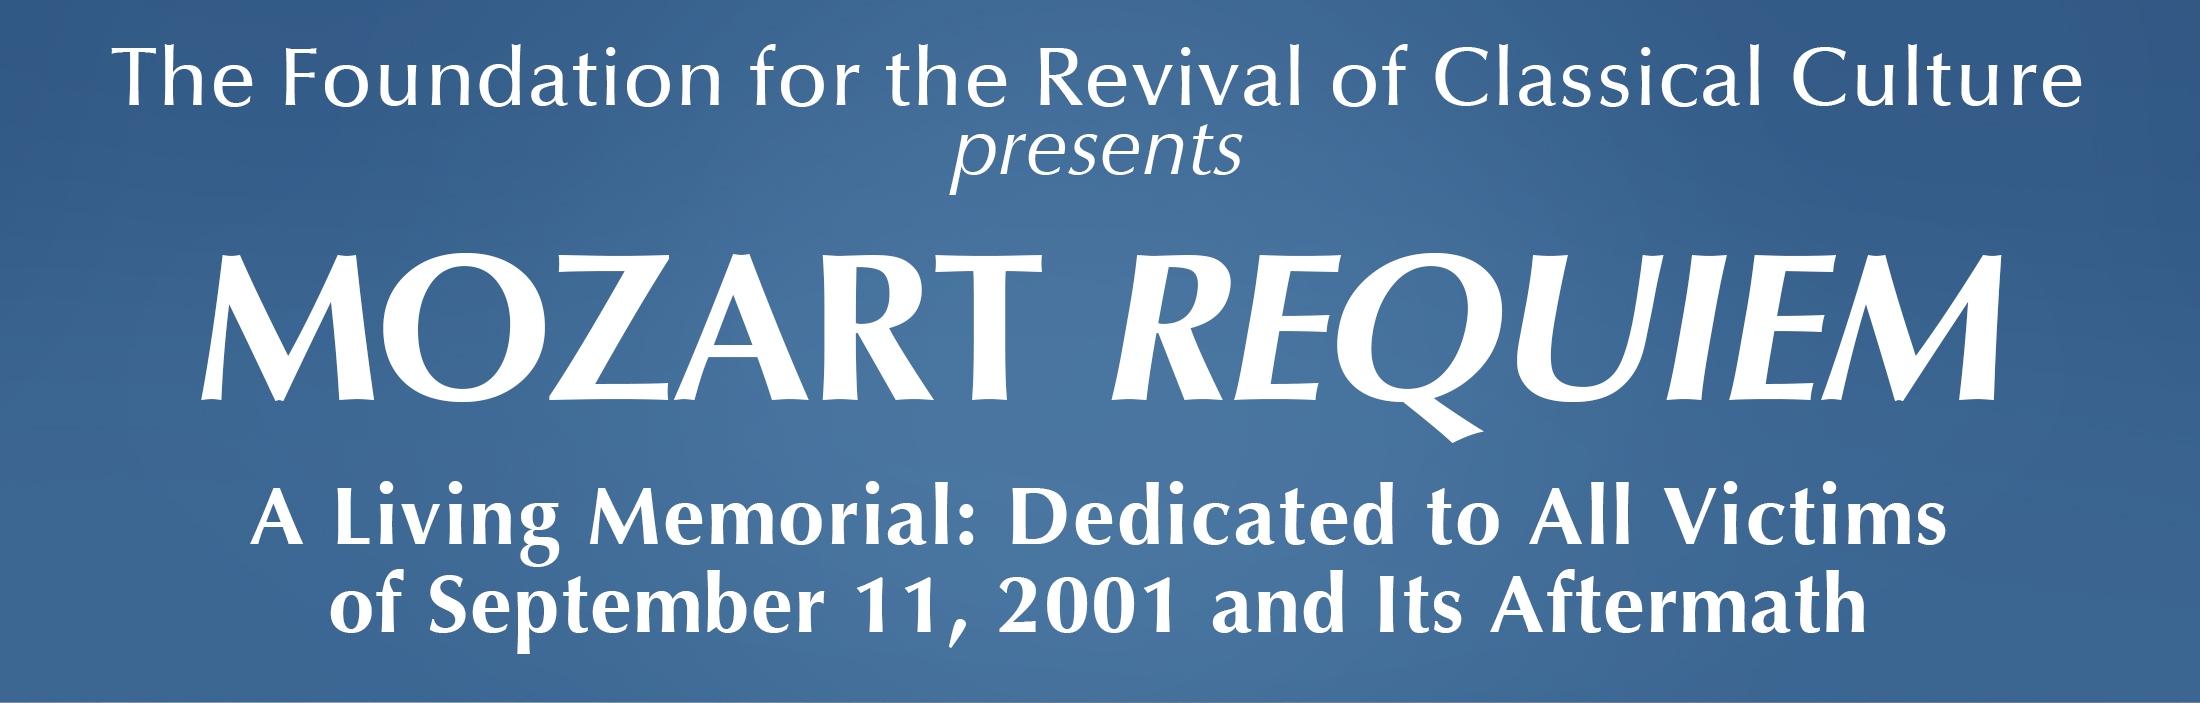 Mozart Requiem poster.jpg